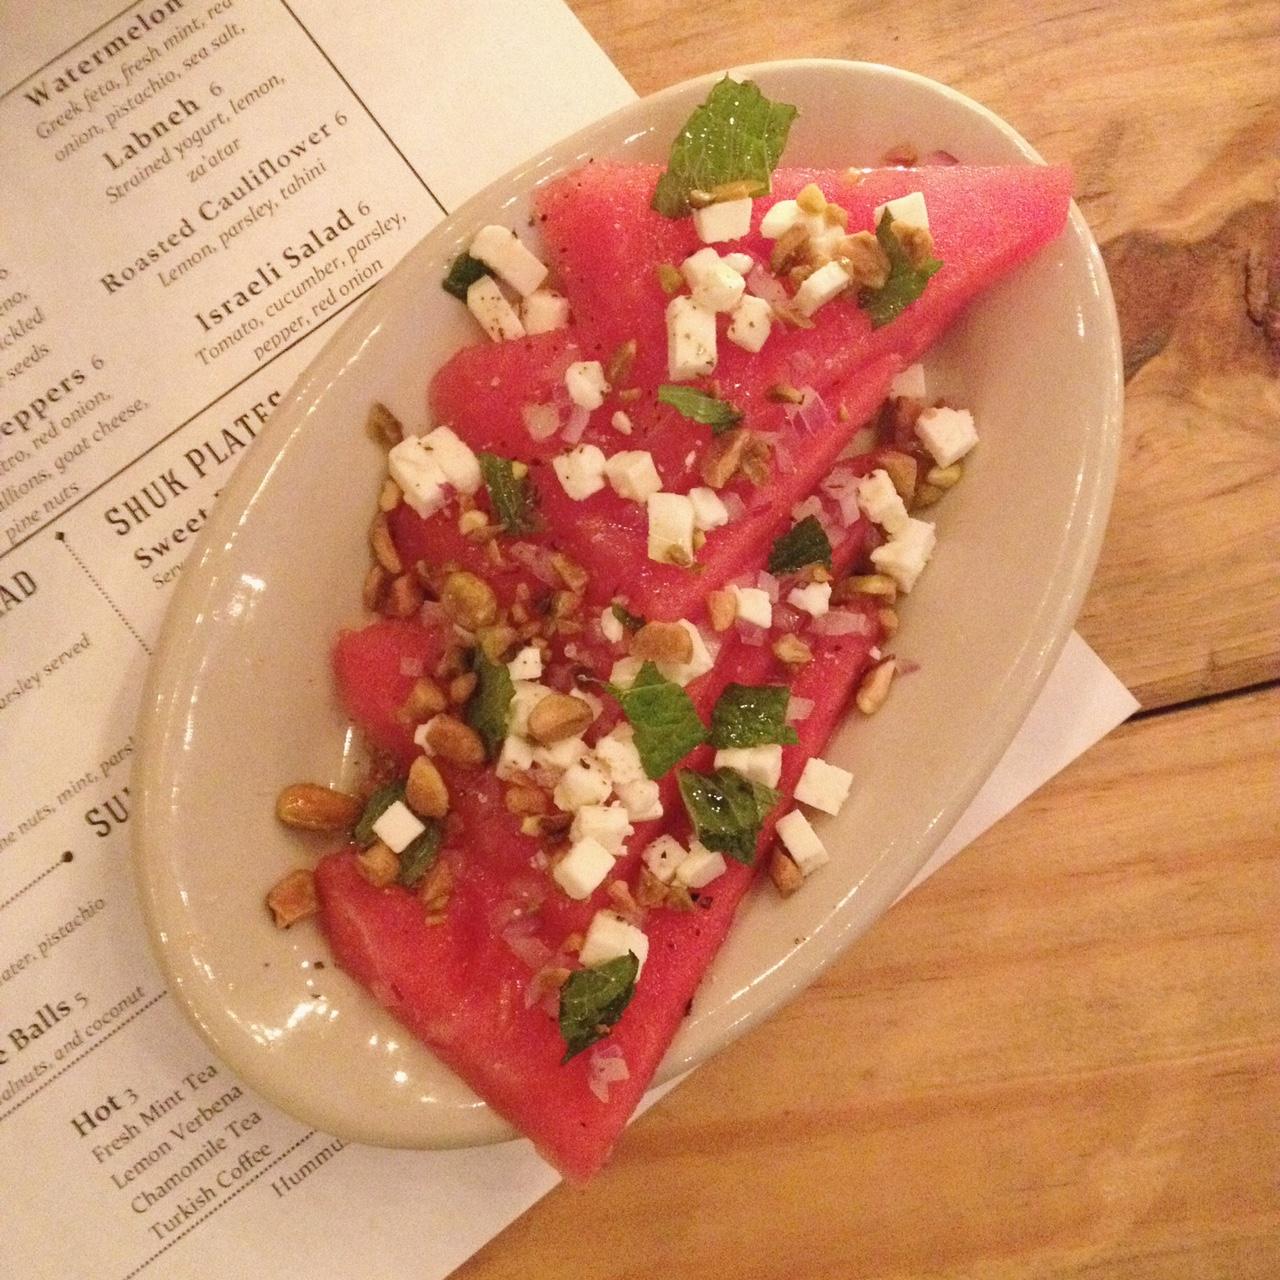 Watermelon with Feta, Hummus Market